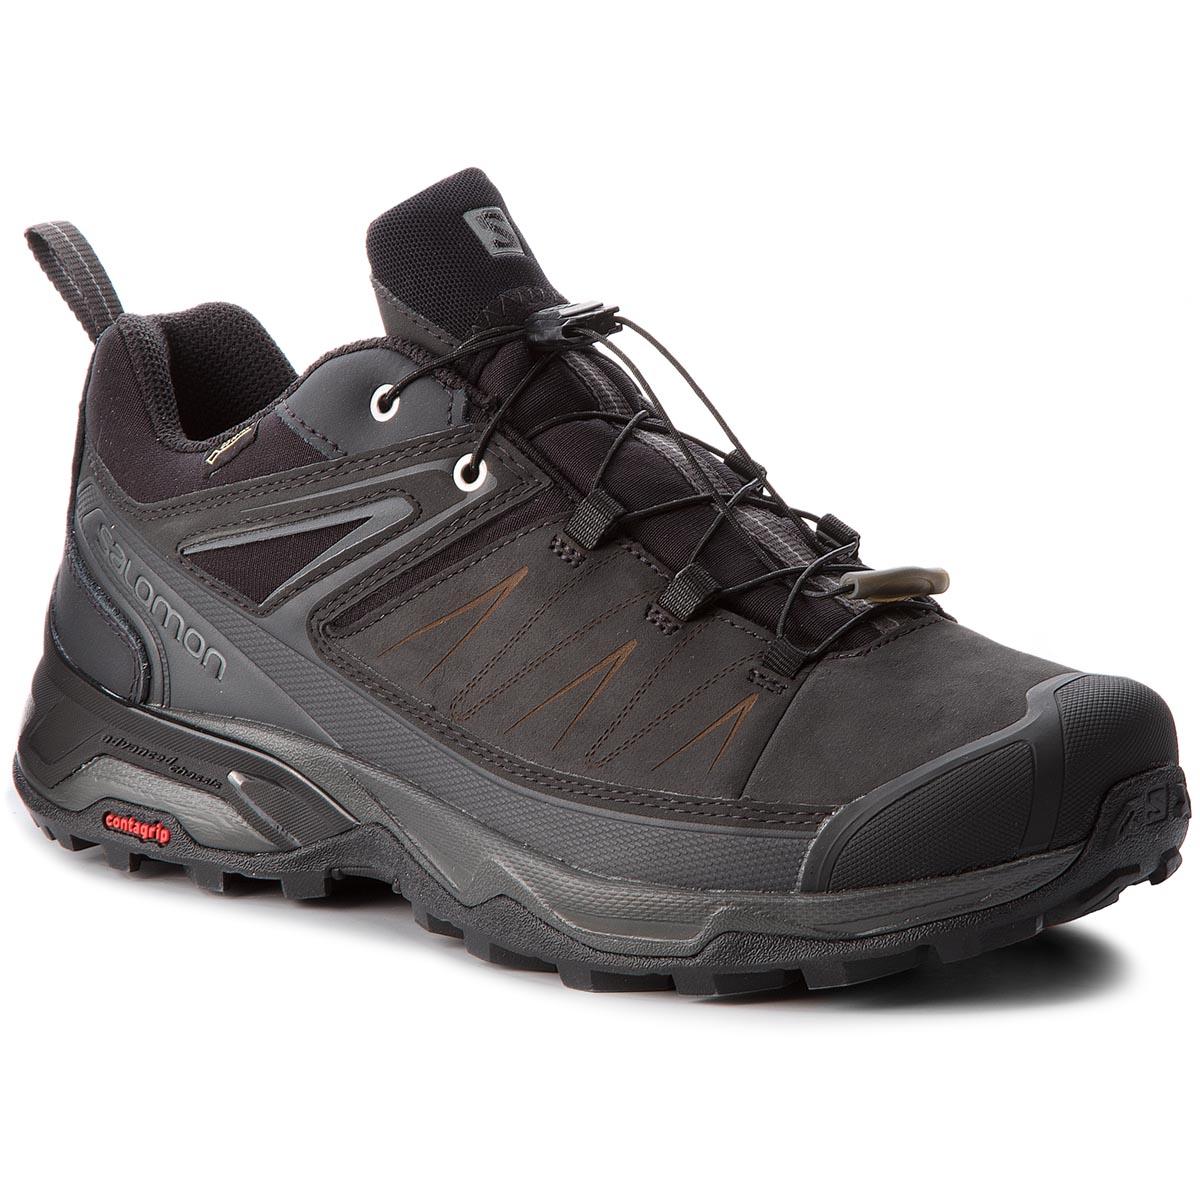 Chaussures de trekking SALOMON Quest Prime Gtx W GORE TEX 404636 22 V0 LeadStormy WeatherEggshell Blue